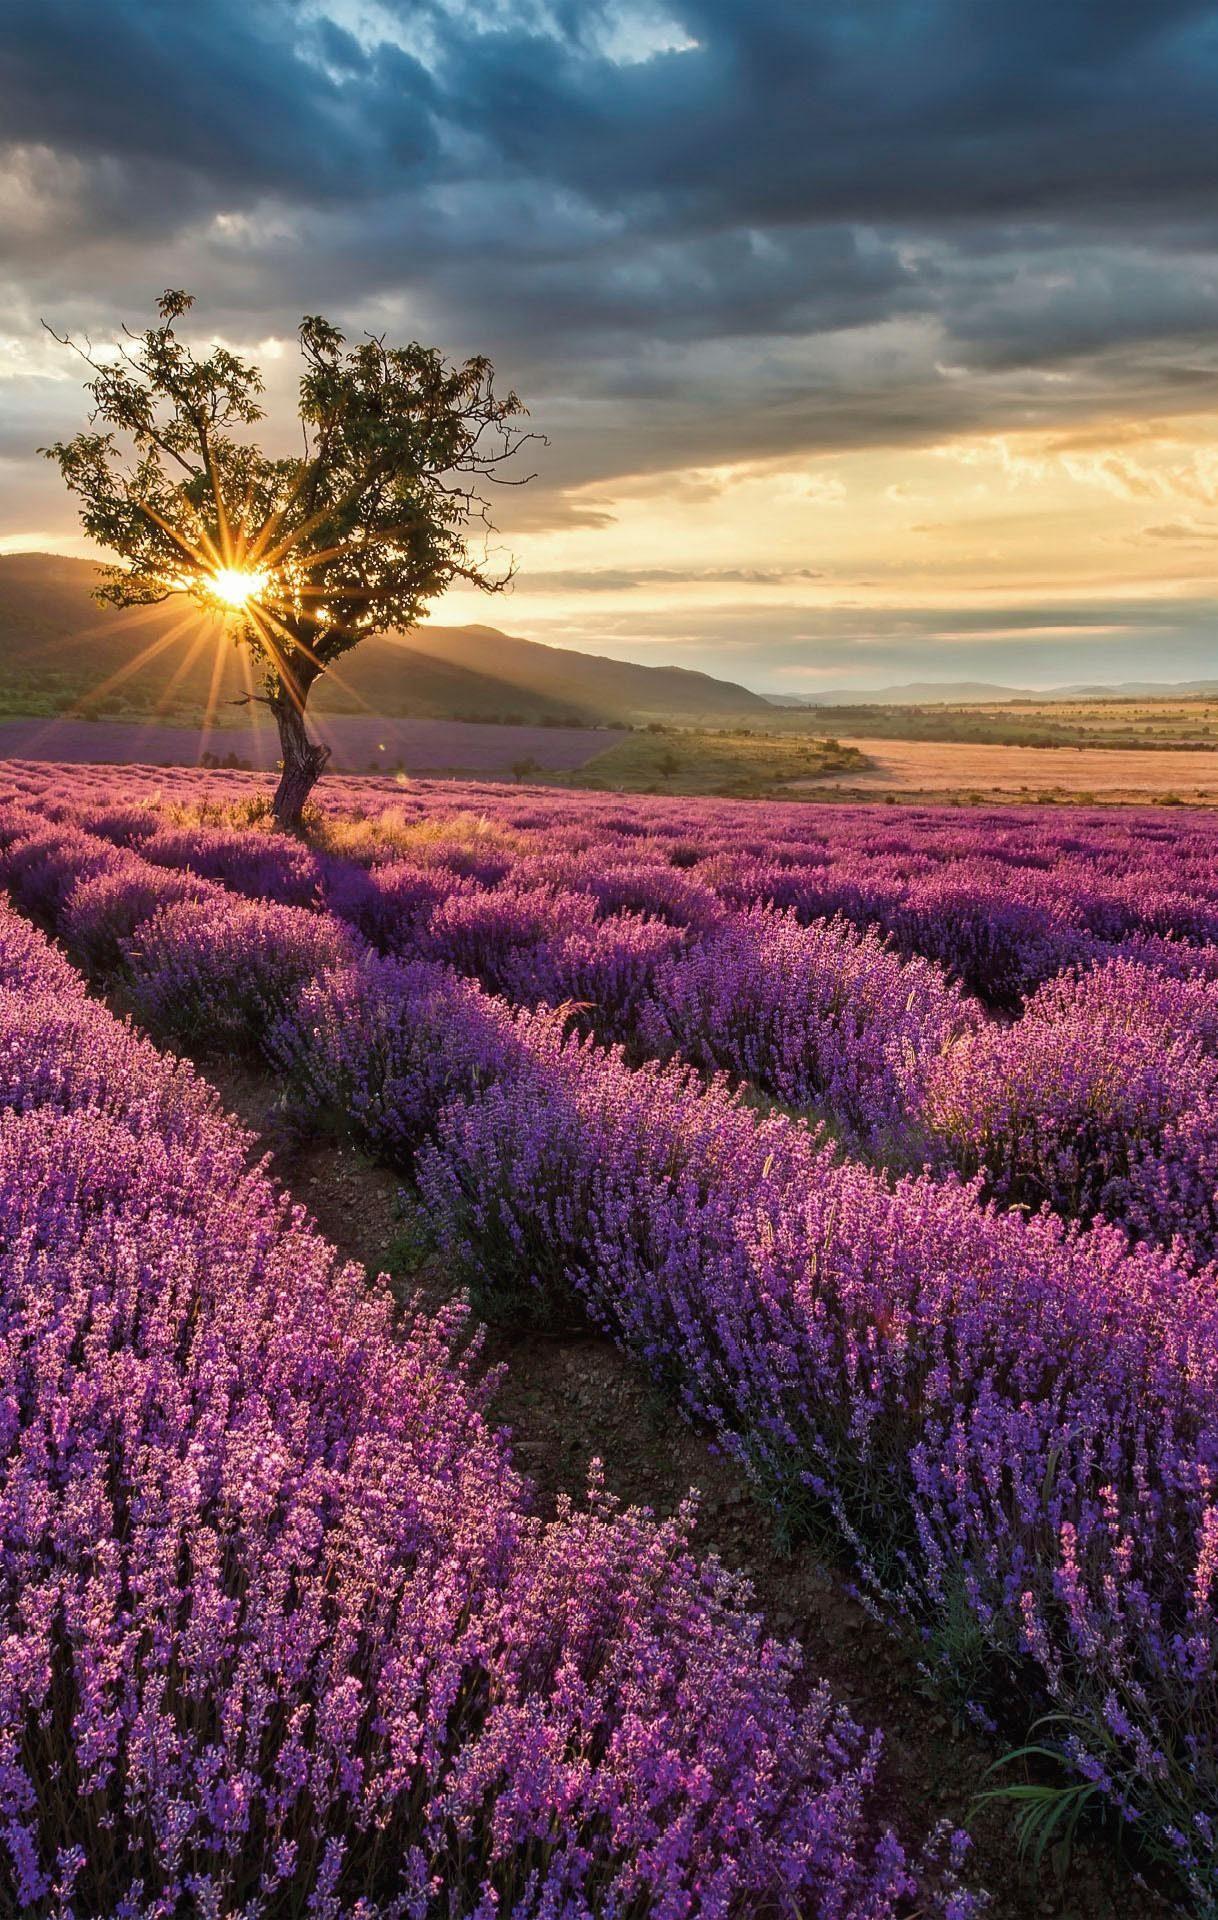 Fototapete »Lavendelblüte in der Provence« 192/260 cm